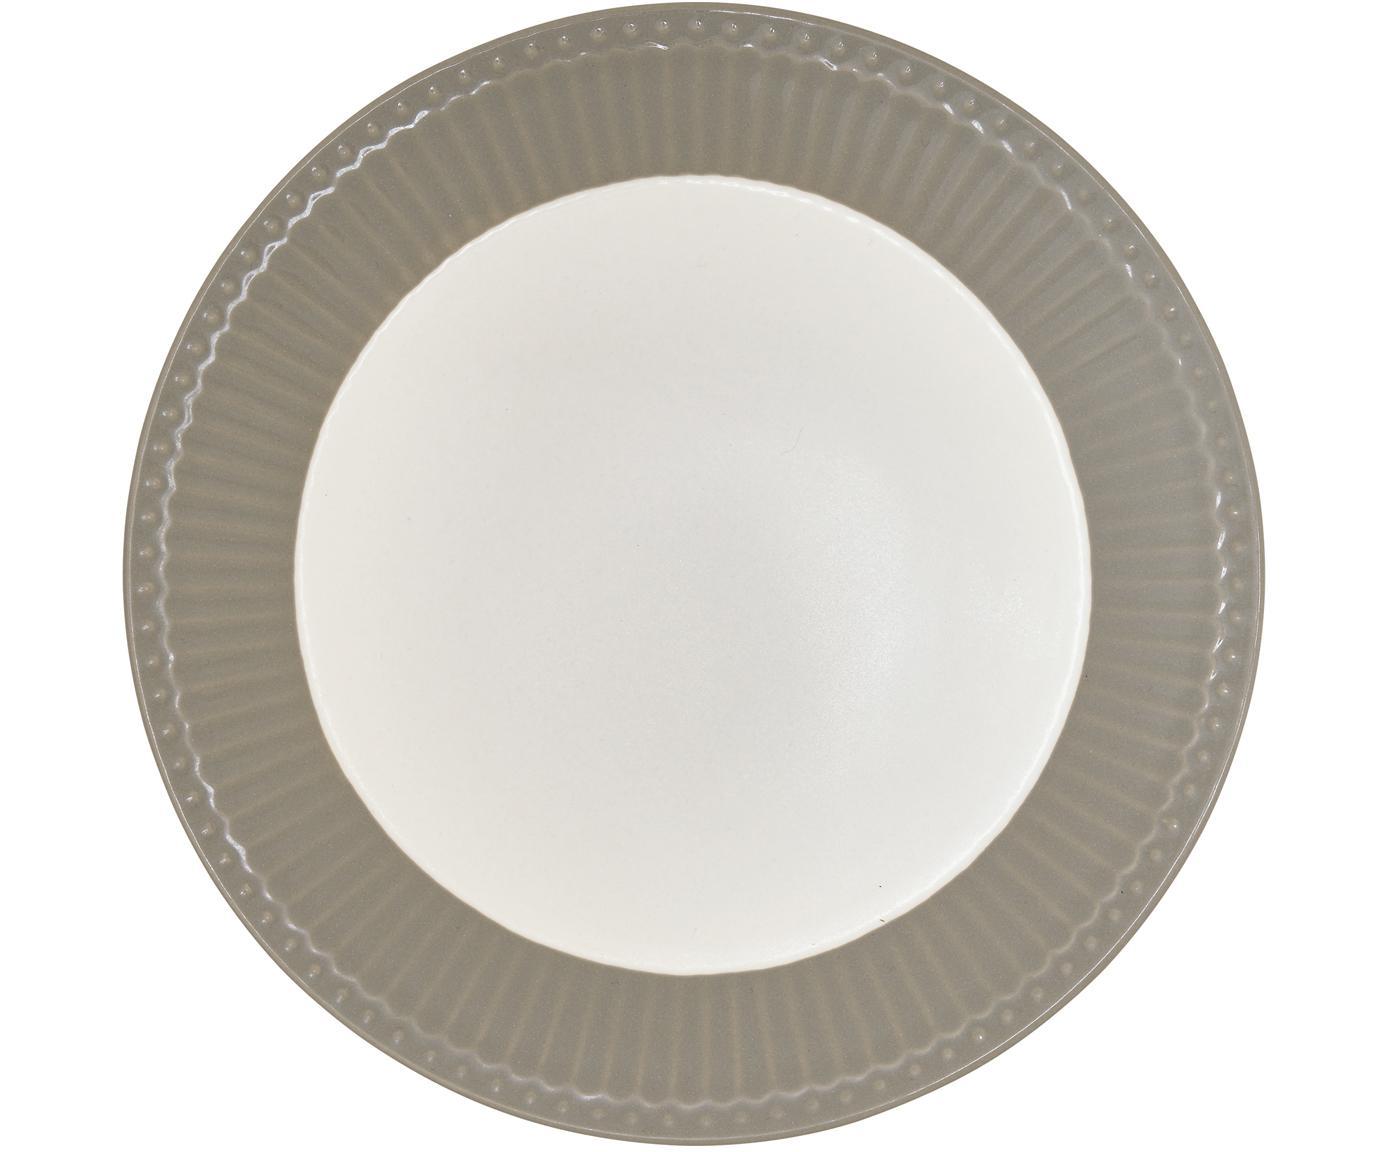 Platos postre Alice, 2uds., Porcelana, Gris, Negro, Ø 23 cm